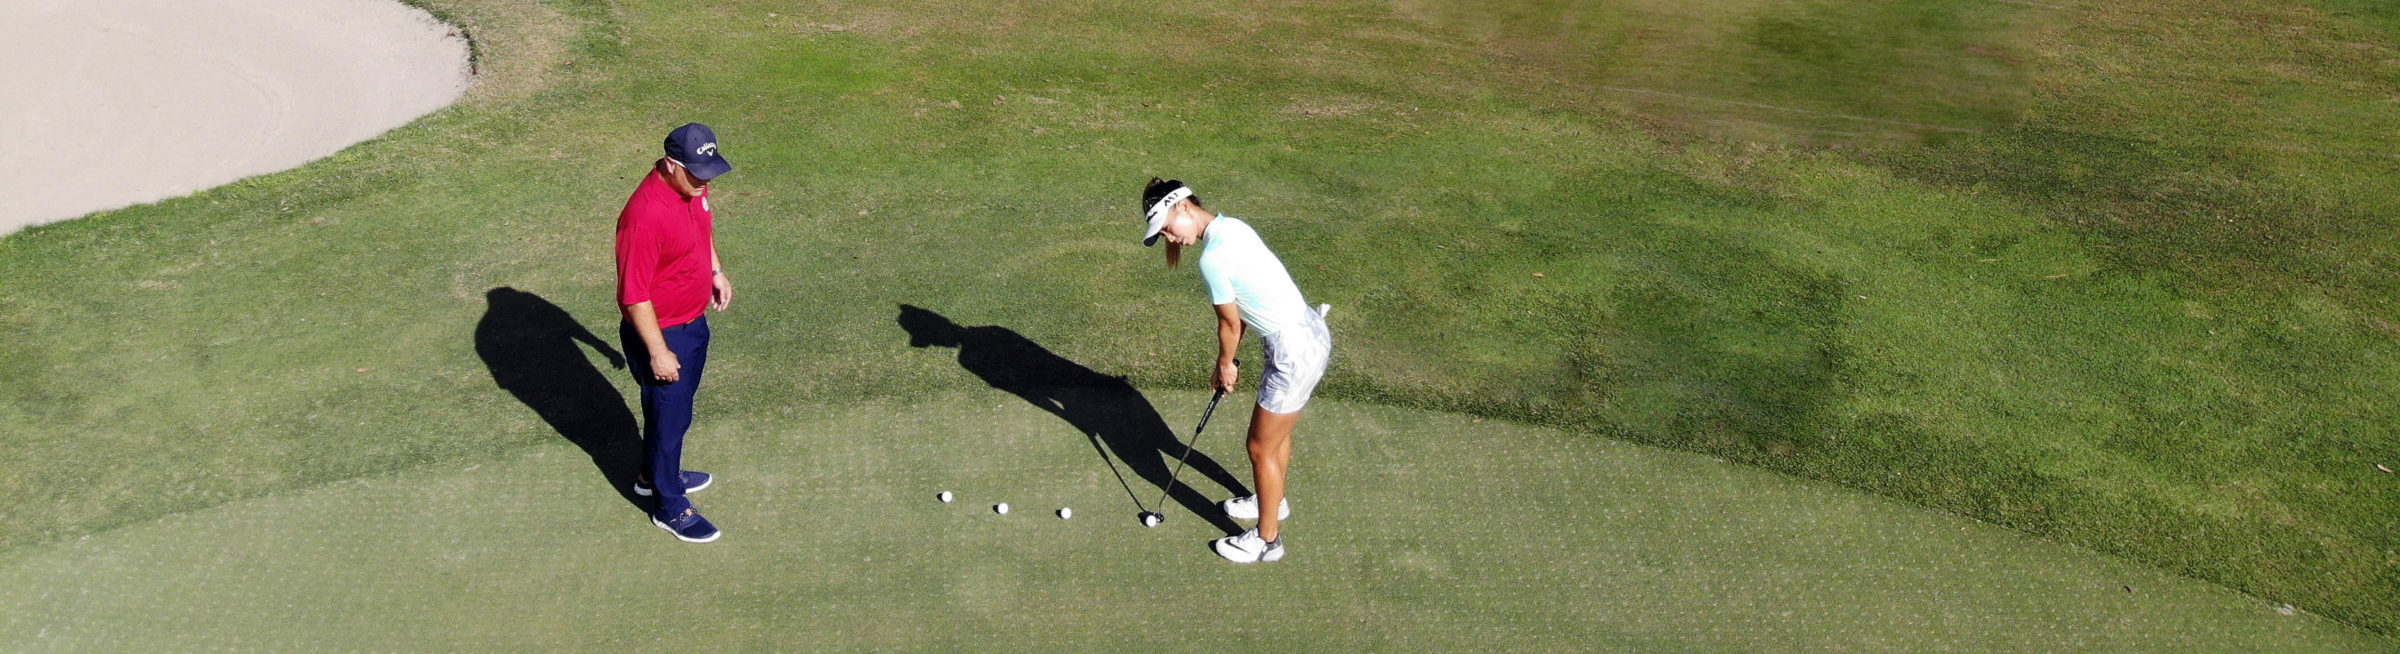 Lesson Programs Charlotte North Carolina Golf Instruction